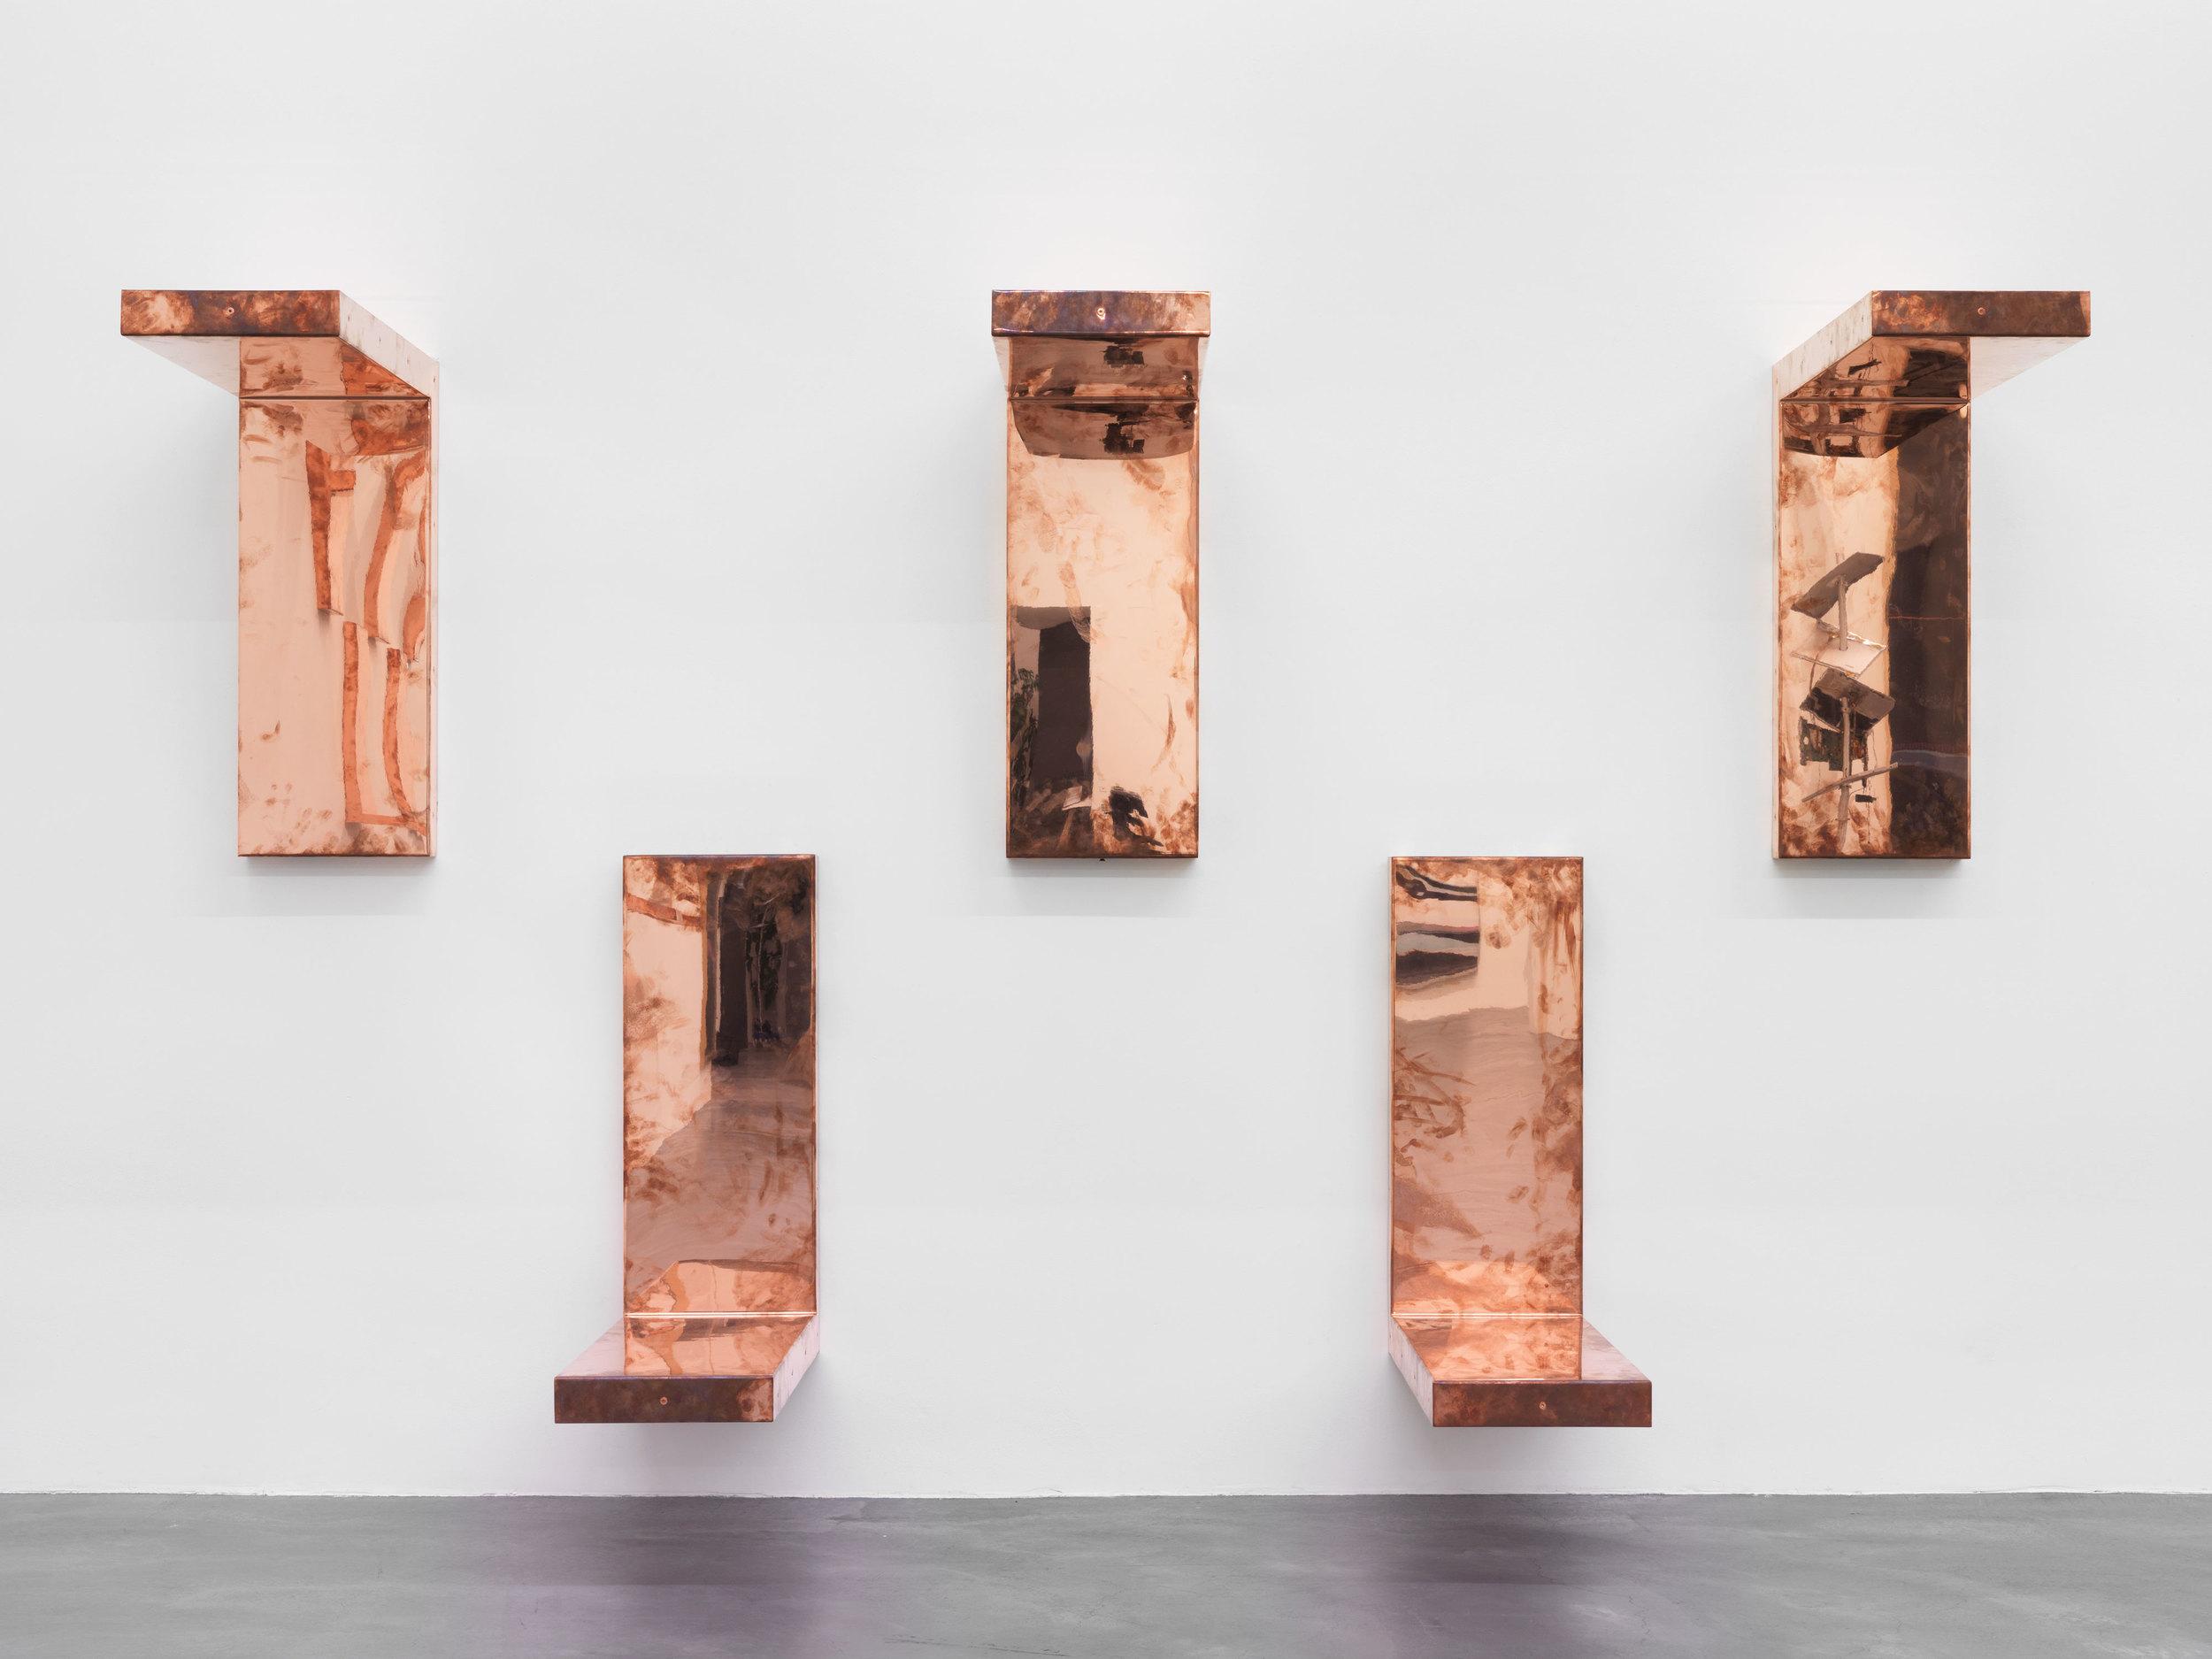 "Detail of Copper Surrogates (60"" x 120"" 48 ounce C11000 Copper Alloy, 90º Bend, 120""Bisection: June 1–8/August 30, 2016, Zürich, Switzerland)    2016–   Polished copper  30 x 11 1/2 x 30 inches, each   Surrogates (Modular, Art Handling), 2014–"